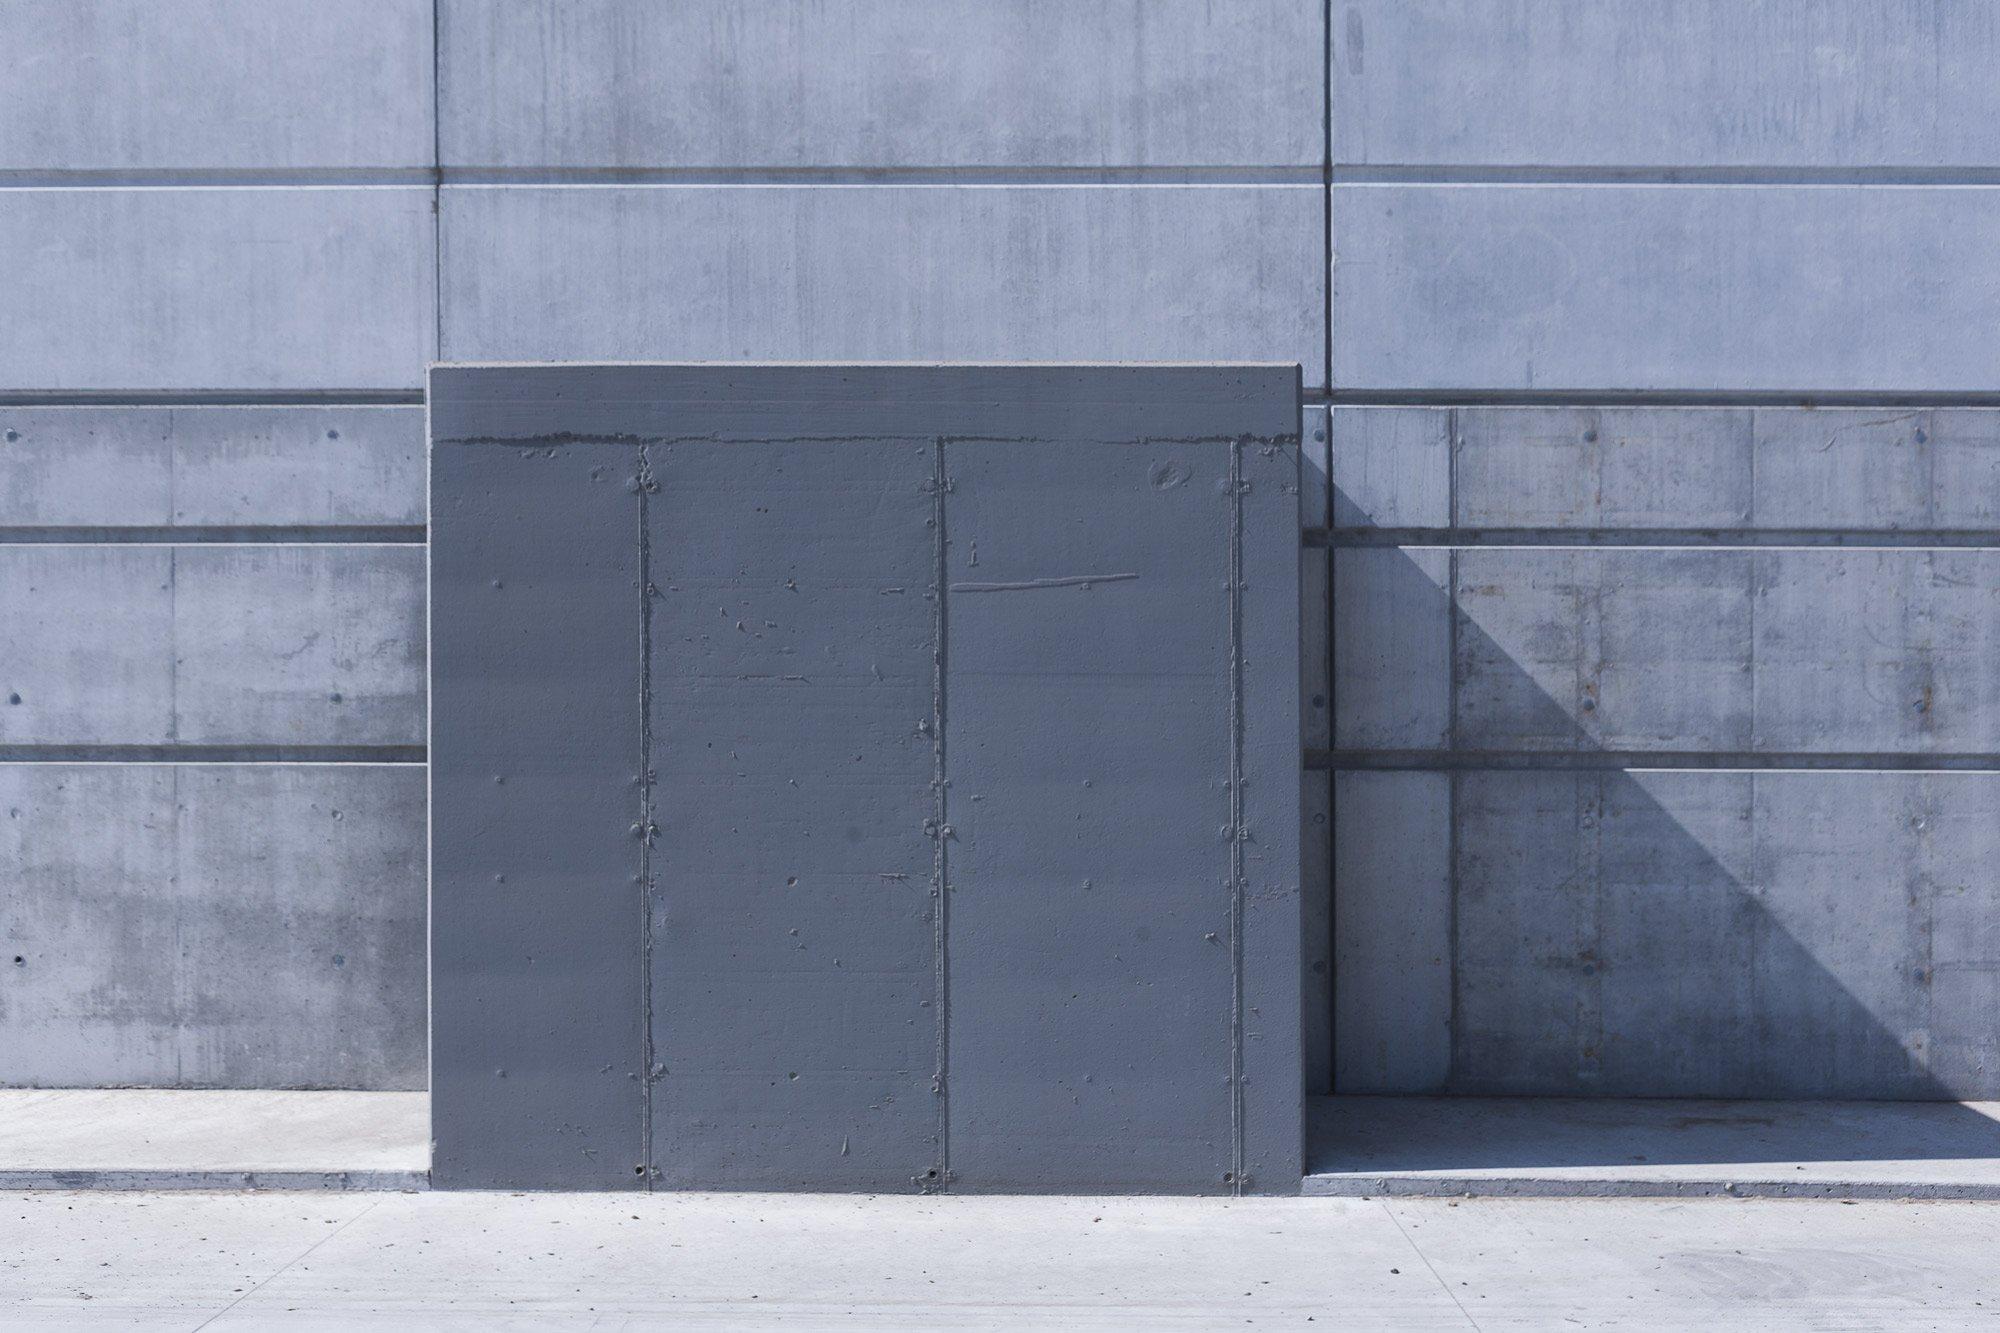 Plaxil 8 © Adriano Ferrara